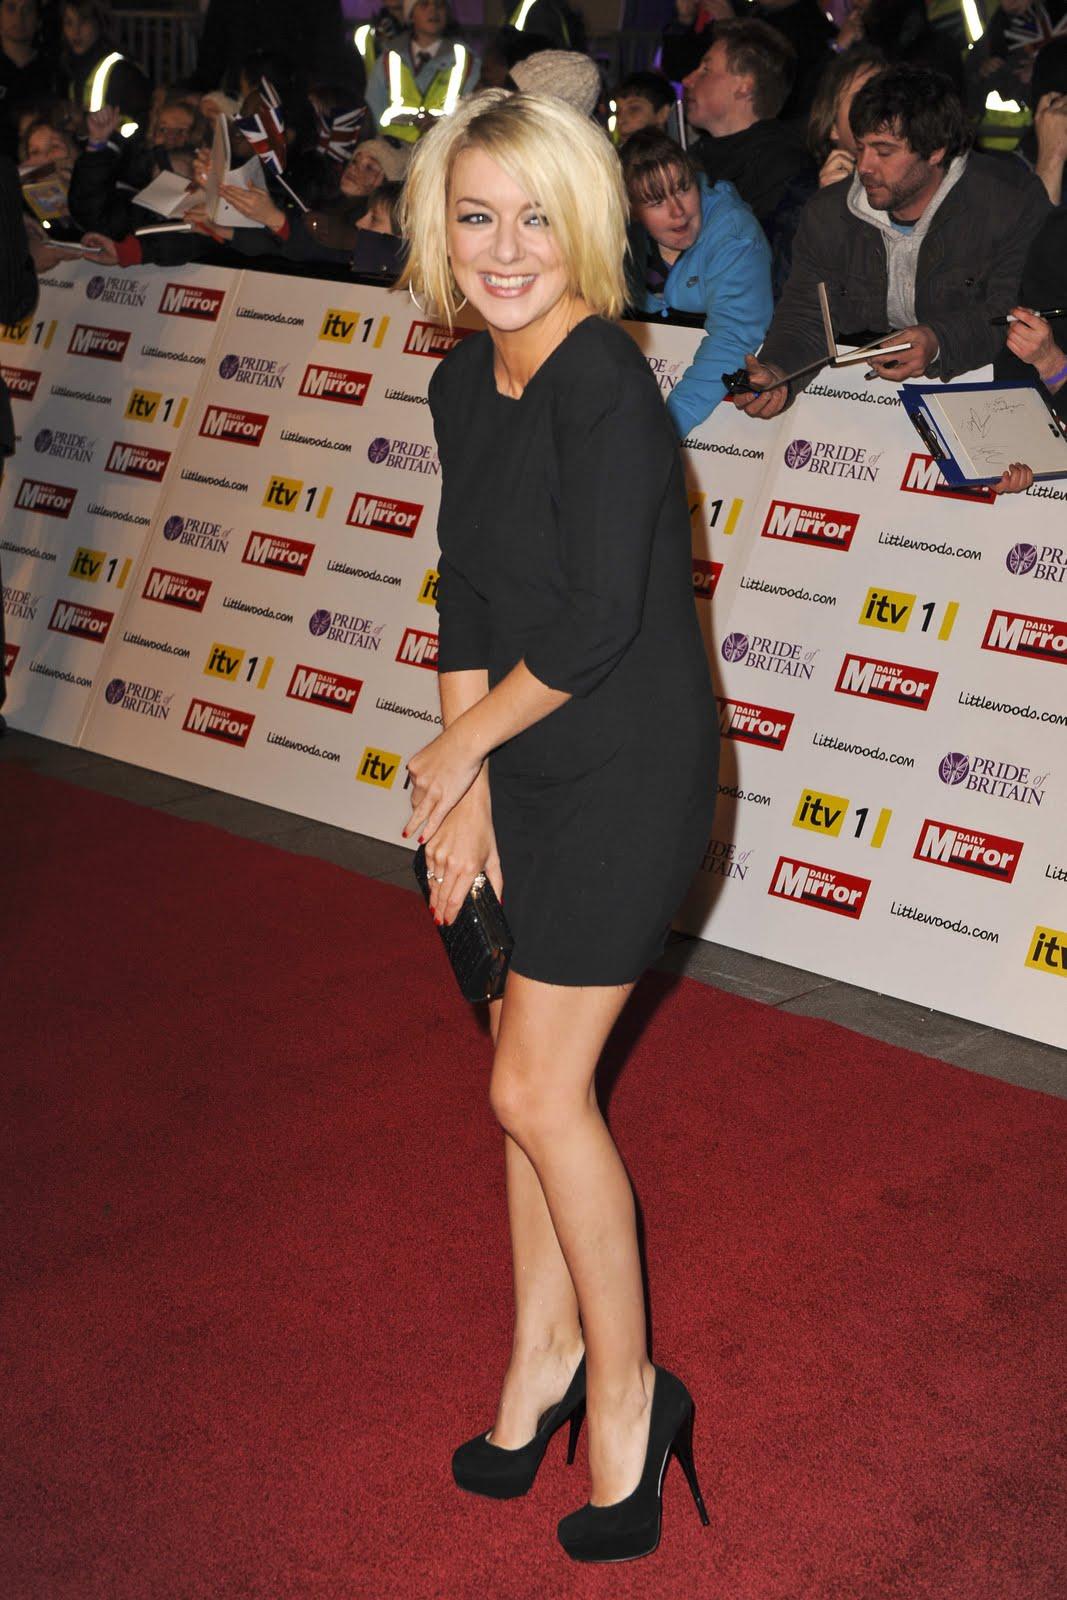 http://3.bp.blogspot.com/_5wt45Sgxoi8/TNpyXmy8ESI/AAAAAAAAEQA/qKTvfRiUGMA/s1600/sheridan_smith_little_black_dress_2.jpg